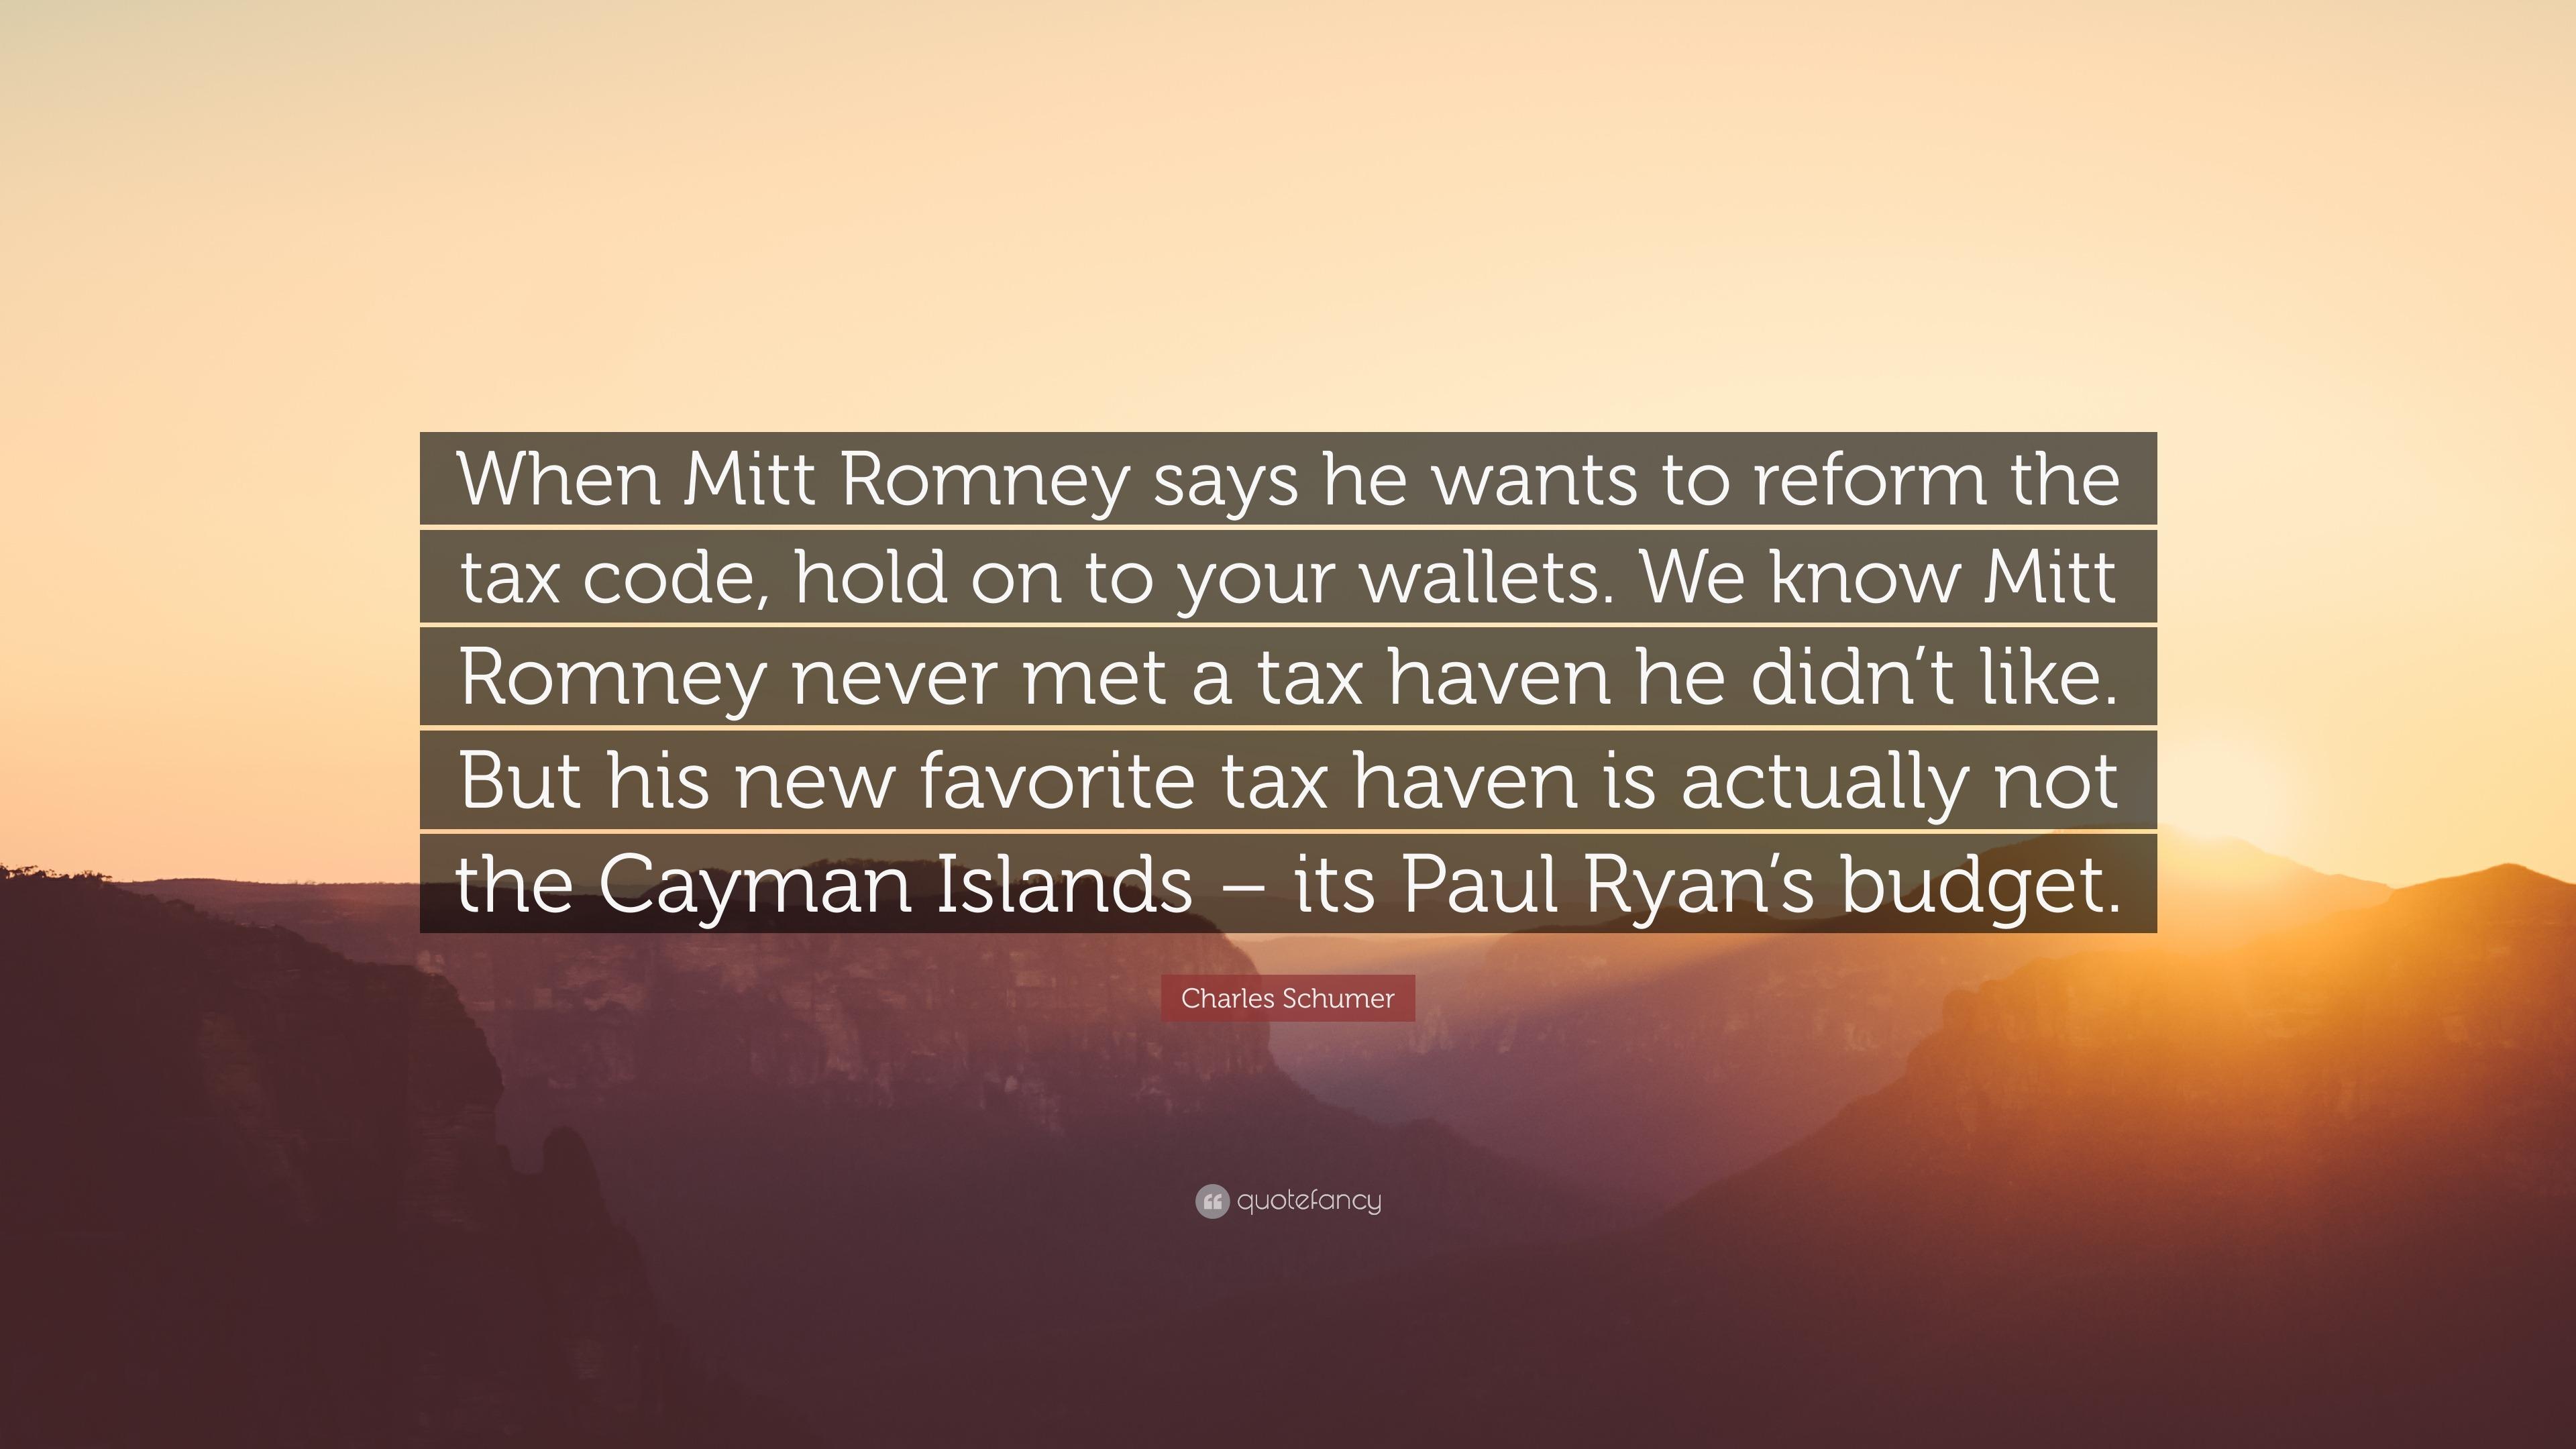 paul ryan mitt romney relationship quotes